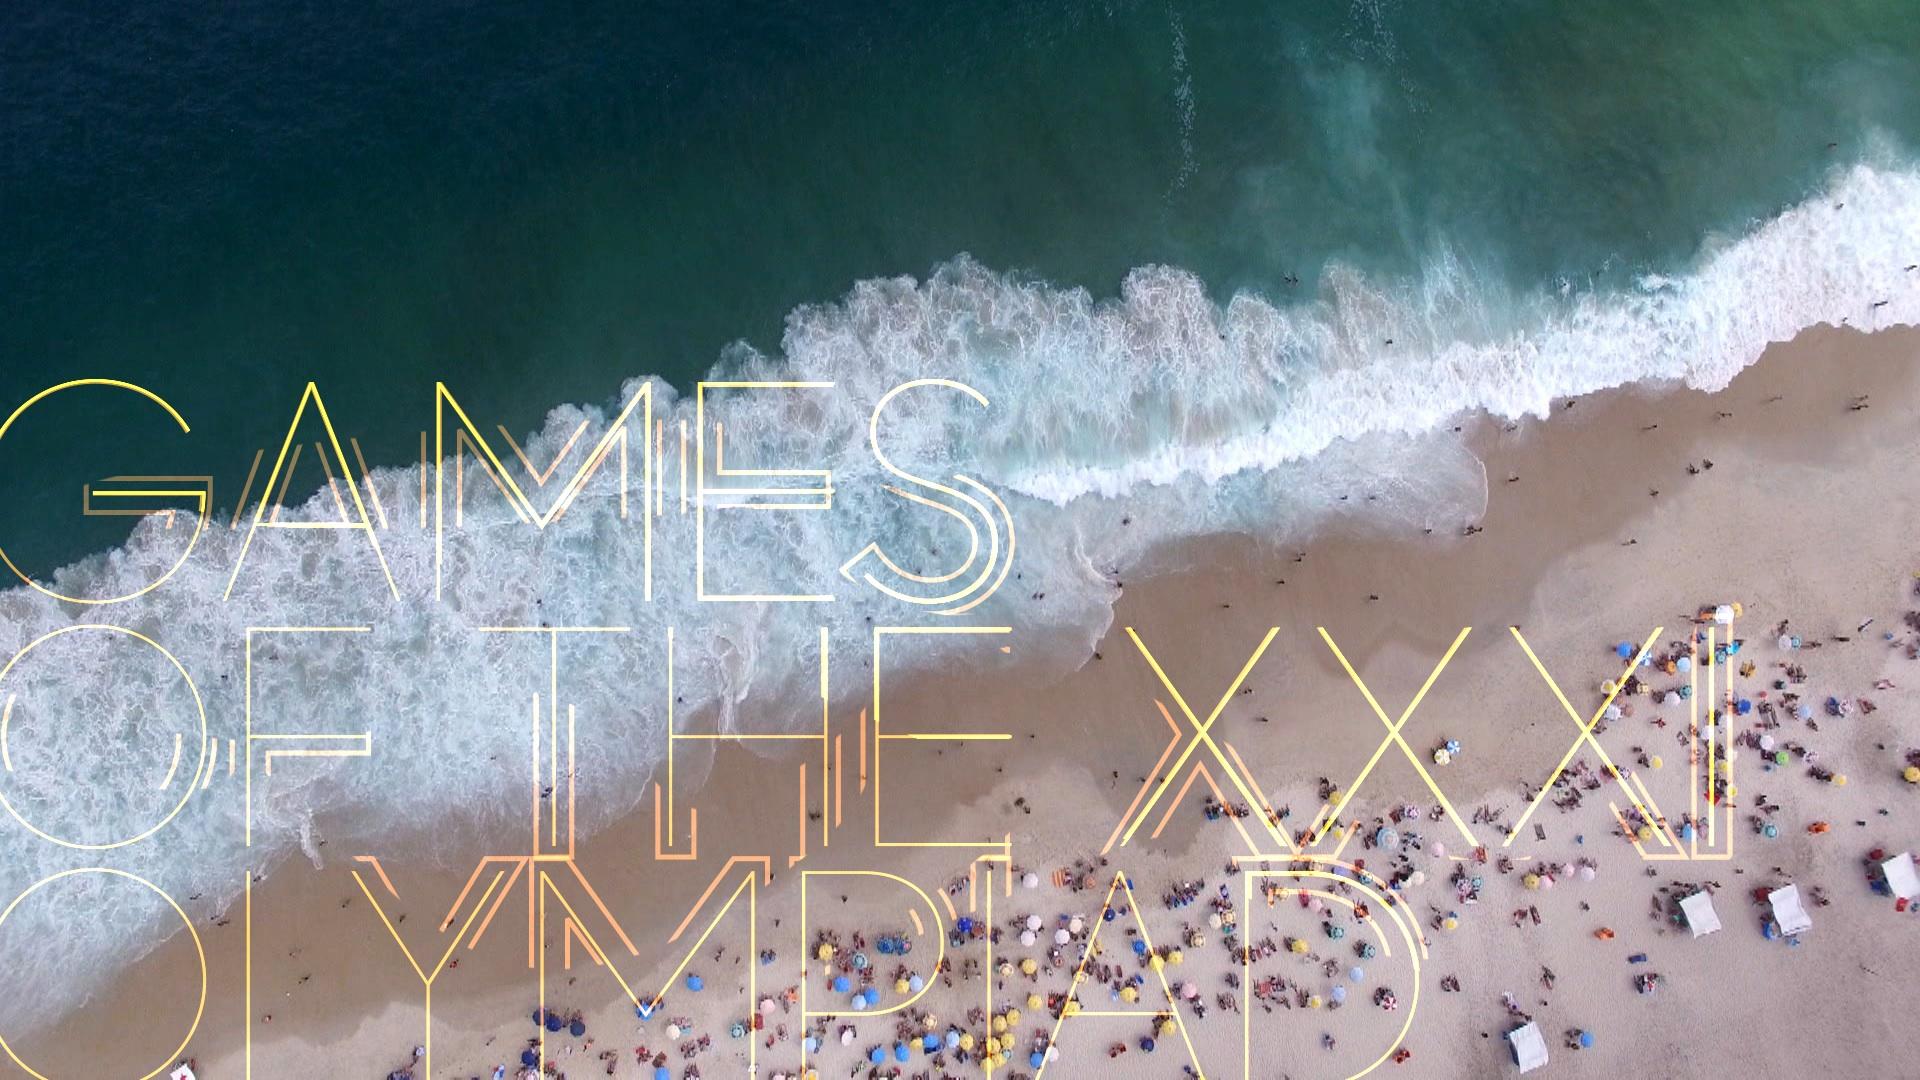 GAMES OF THE XXXI OLYMPIAD - NBC SPORTS & OLYMPICS